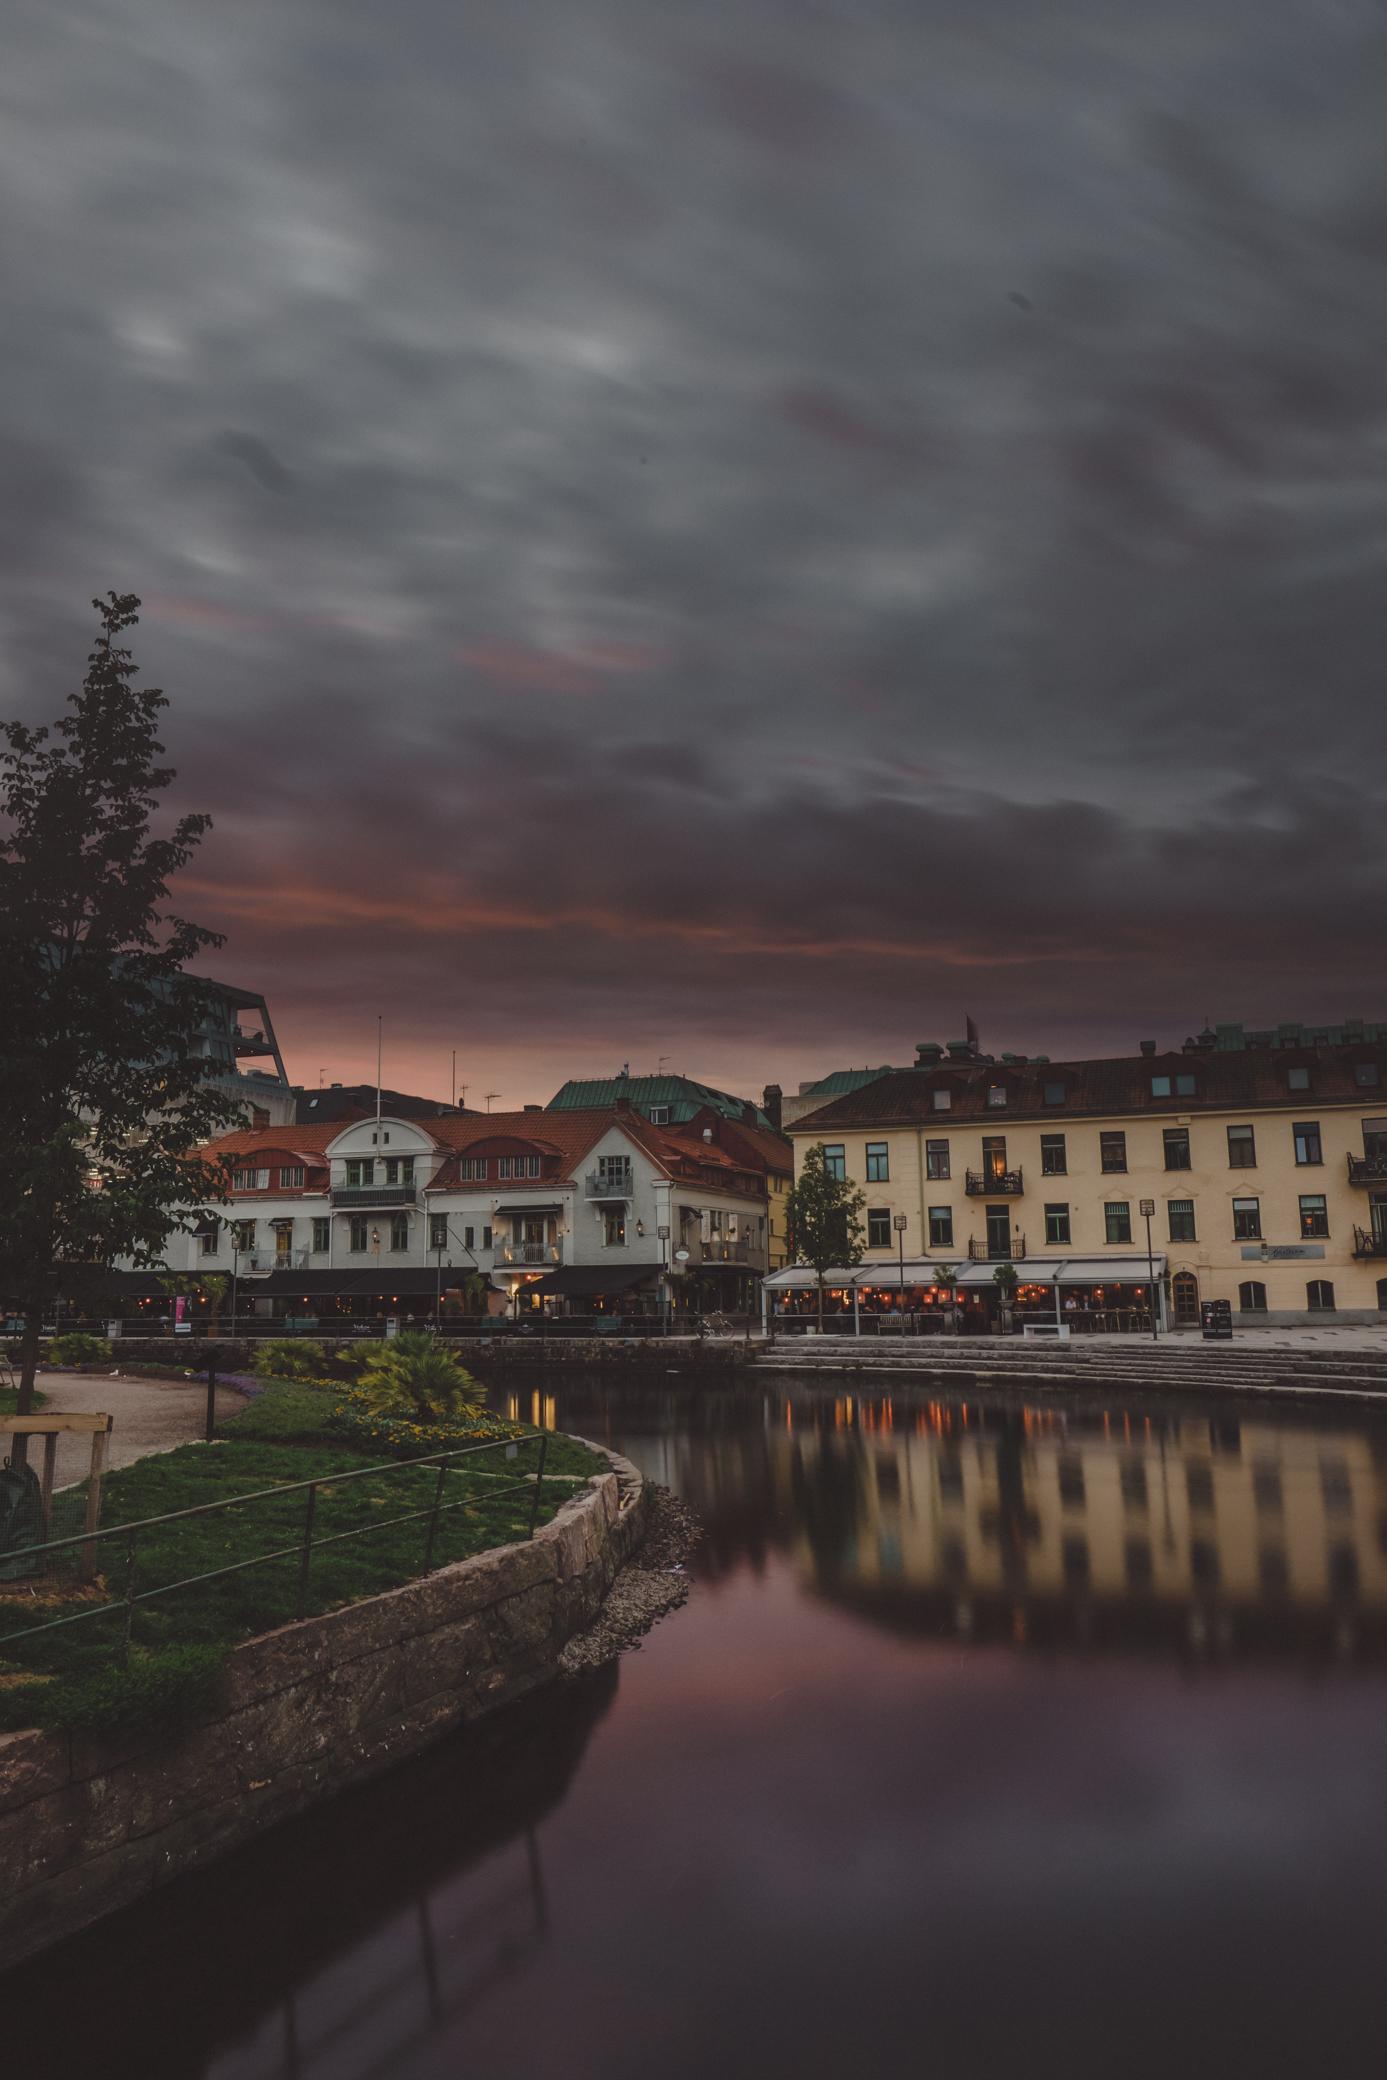 stadsfoto_borås_fotograf_max_norin-4.jpg